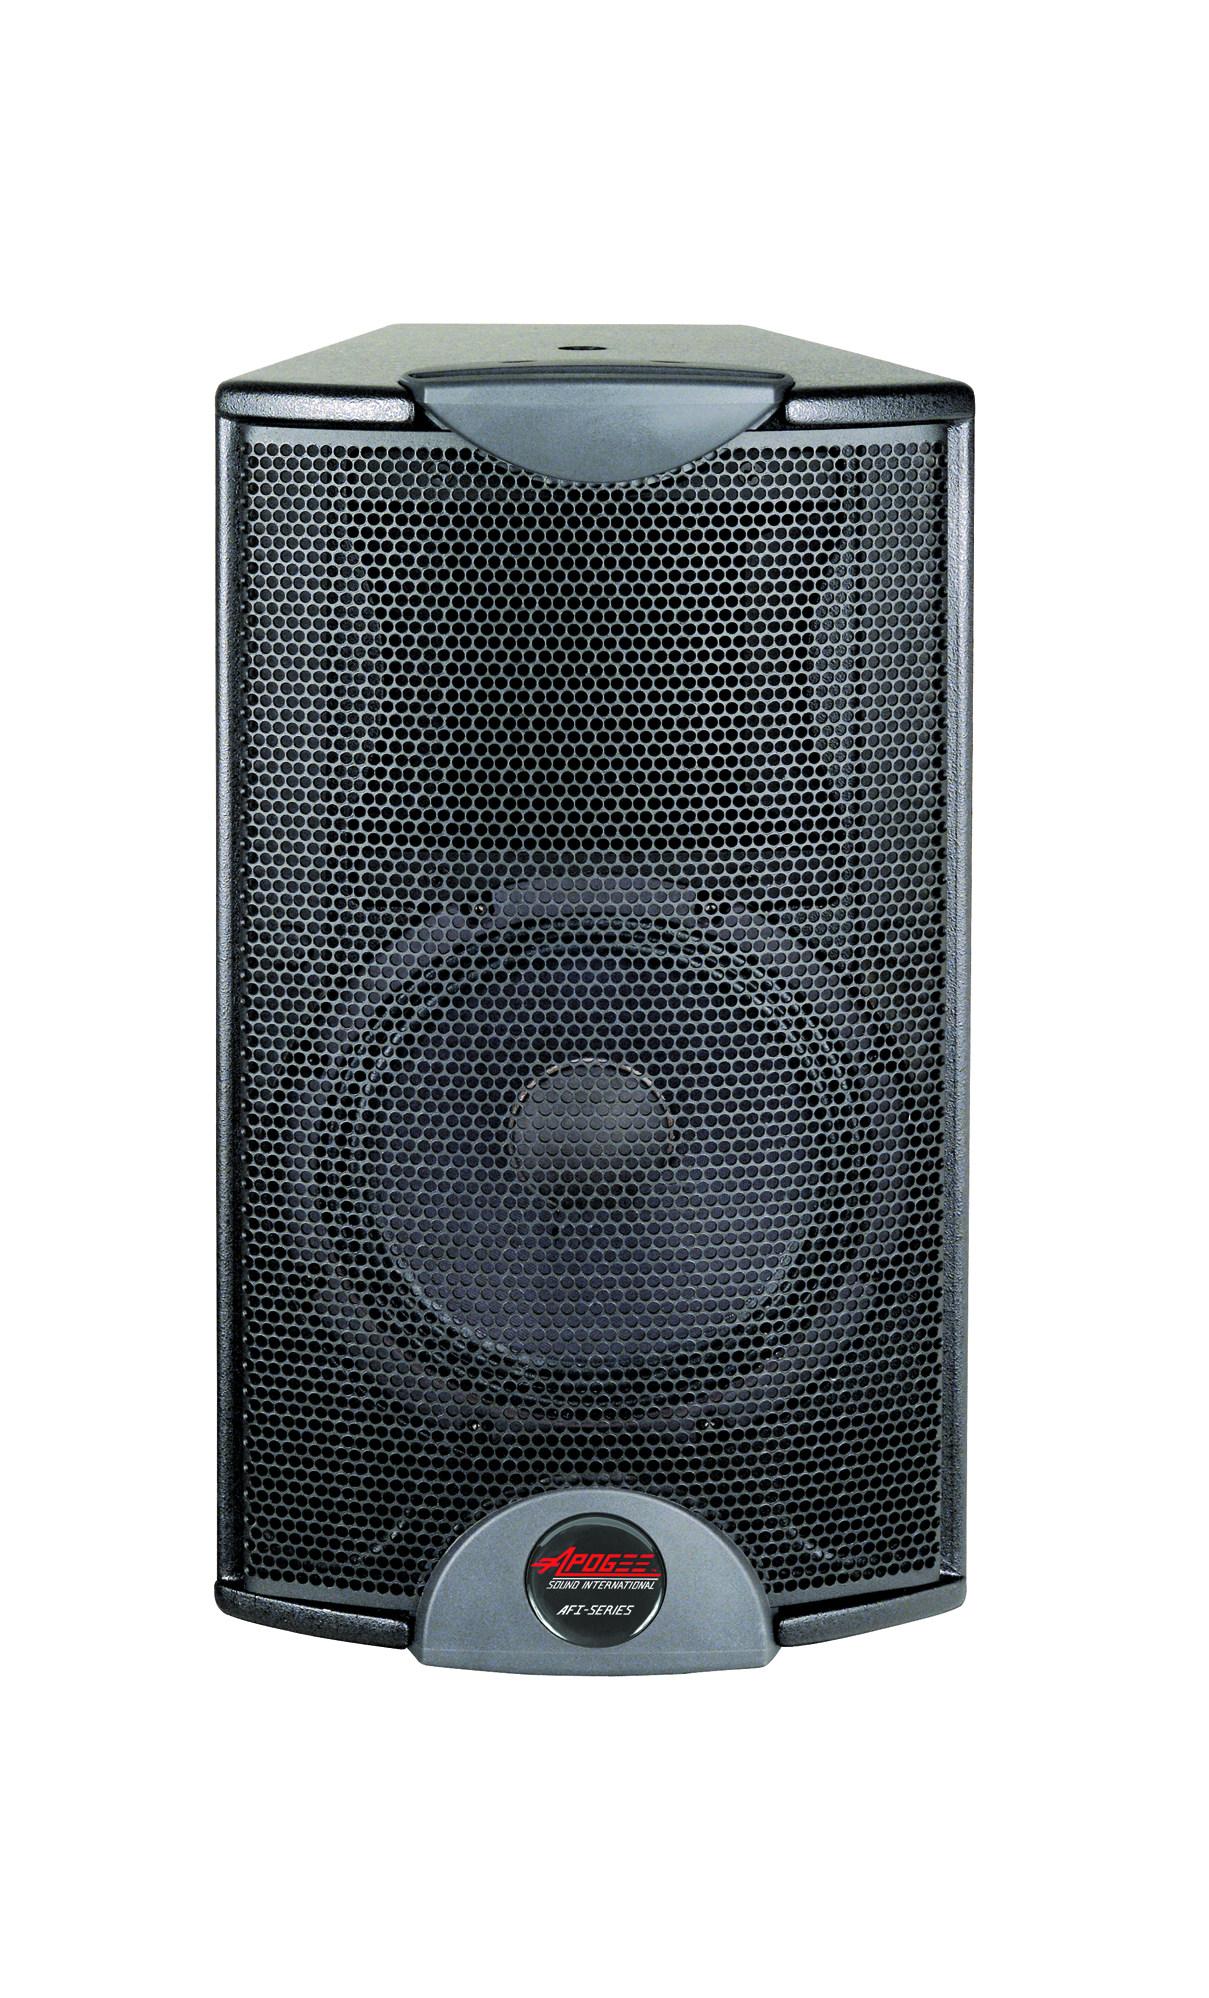 Contractor Series Loudspeaker System, Black Finish